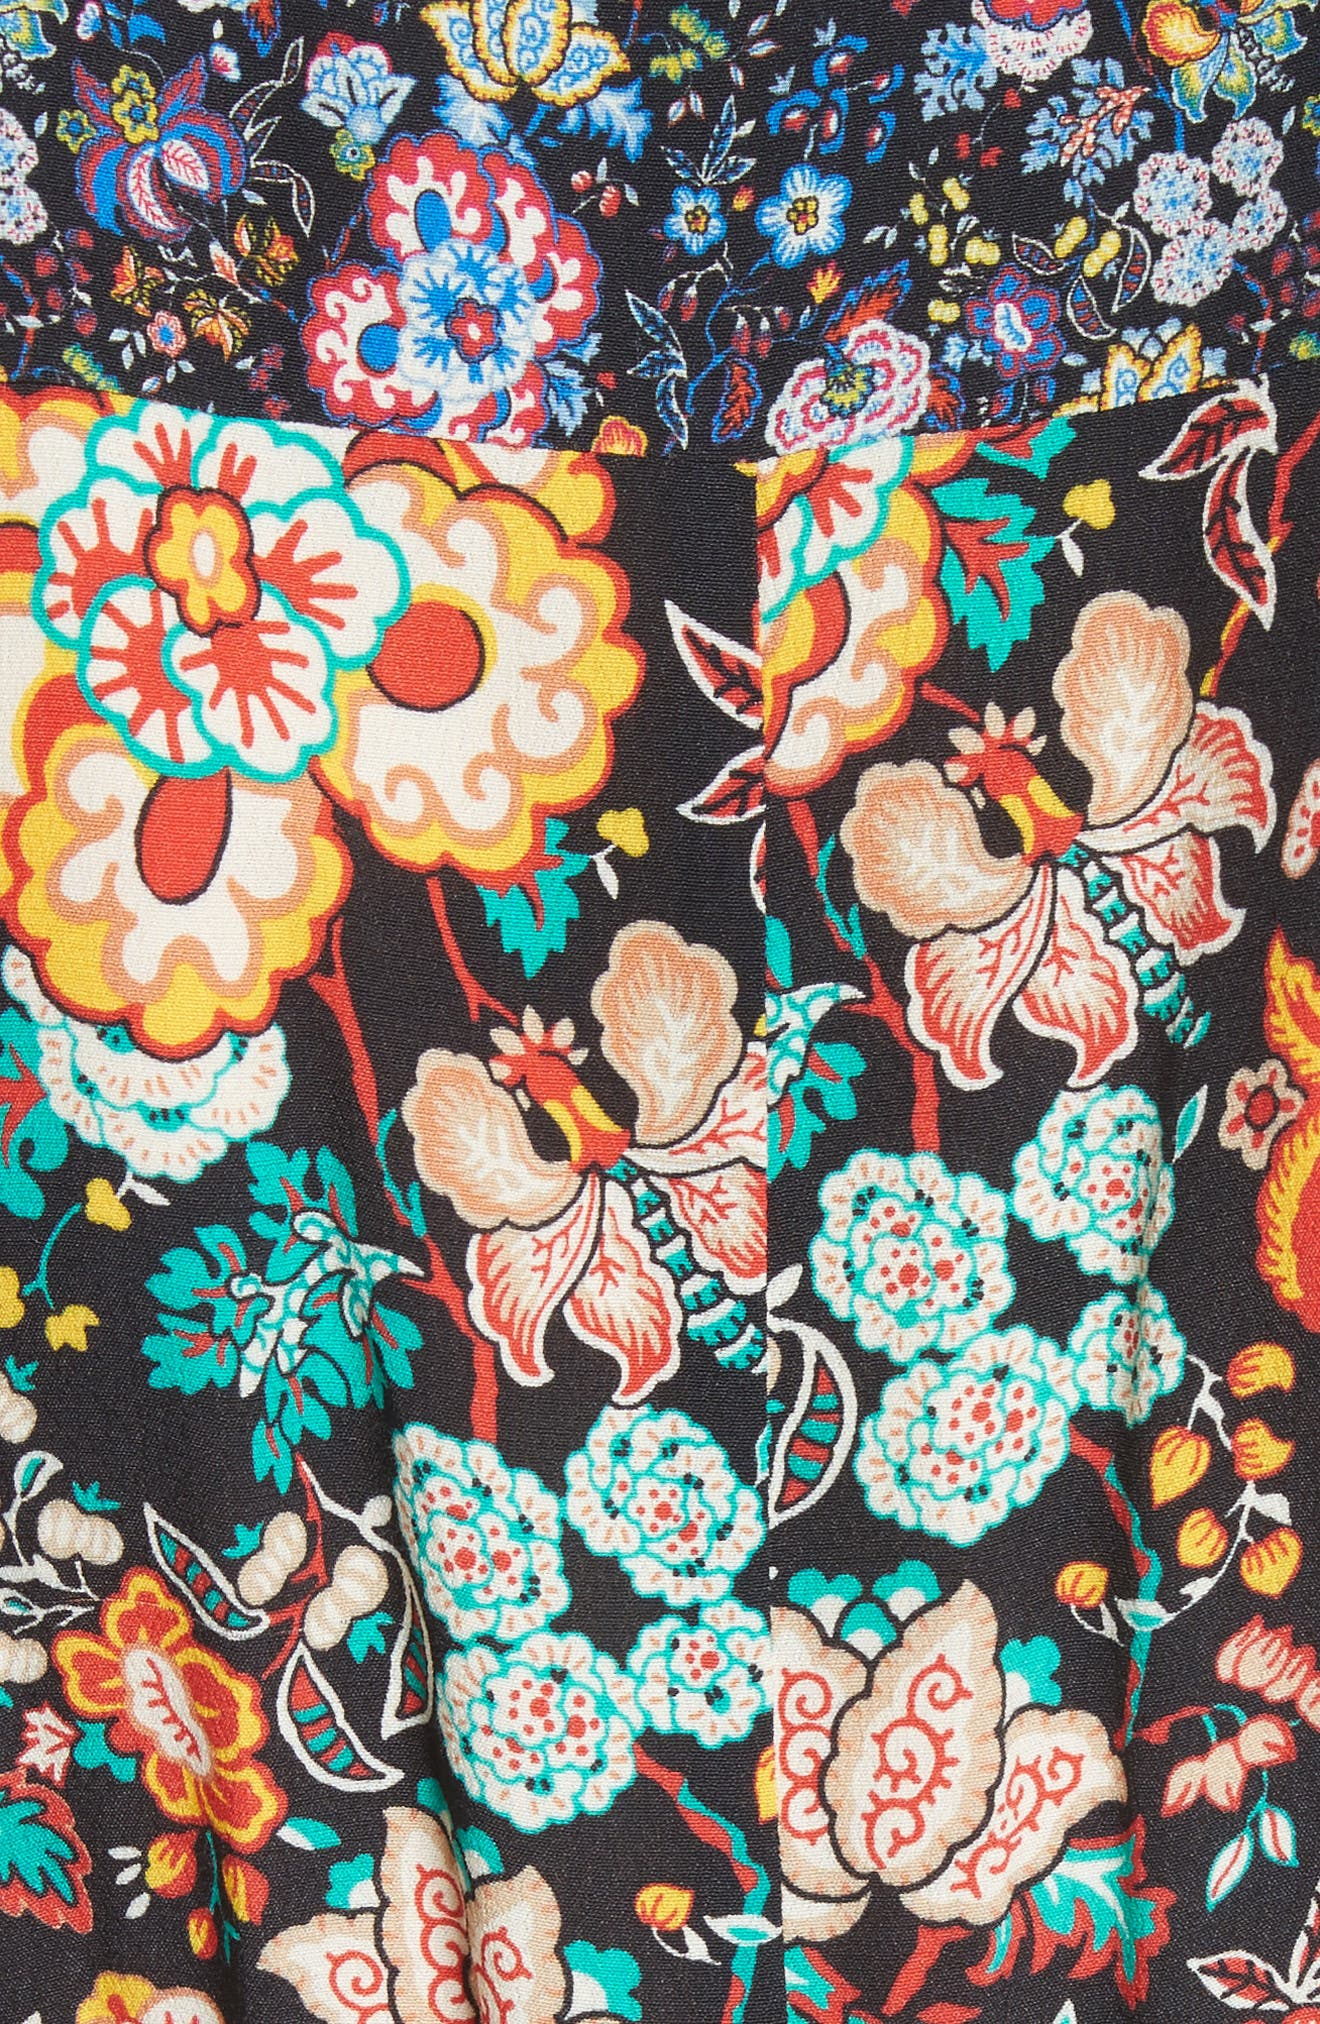 Mixed Floral Wrap Dress,                             Alternate thumbnail 5, color,